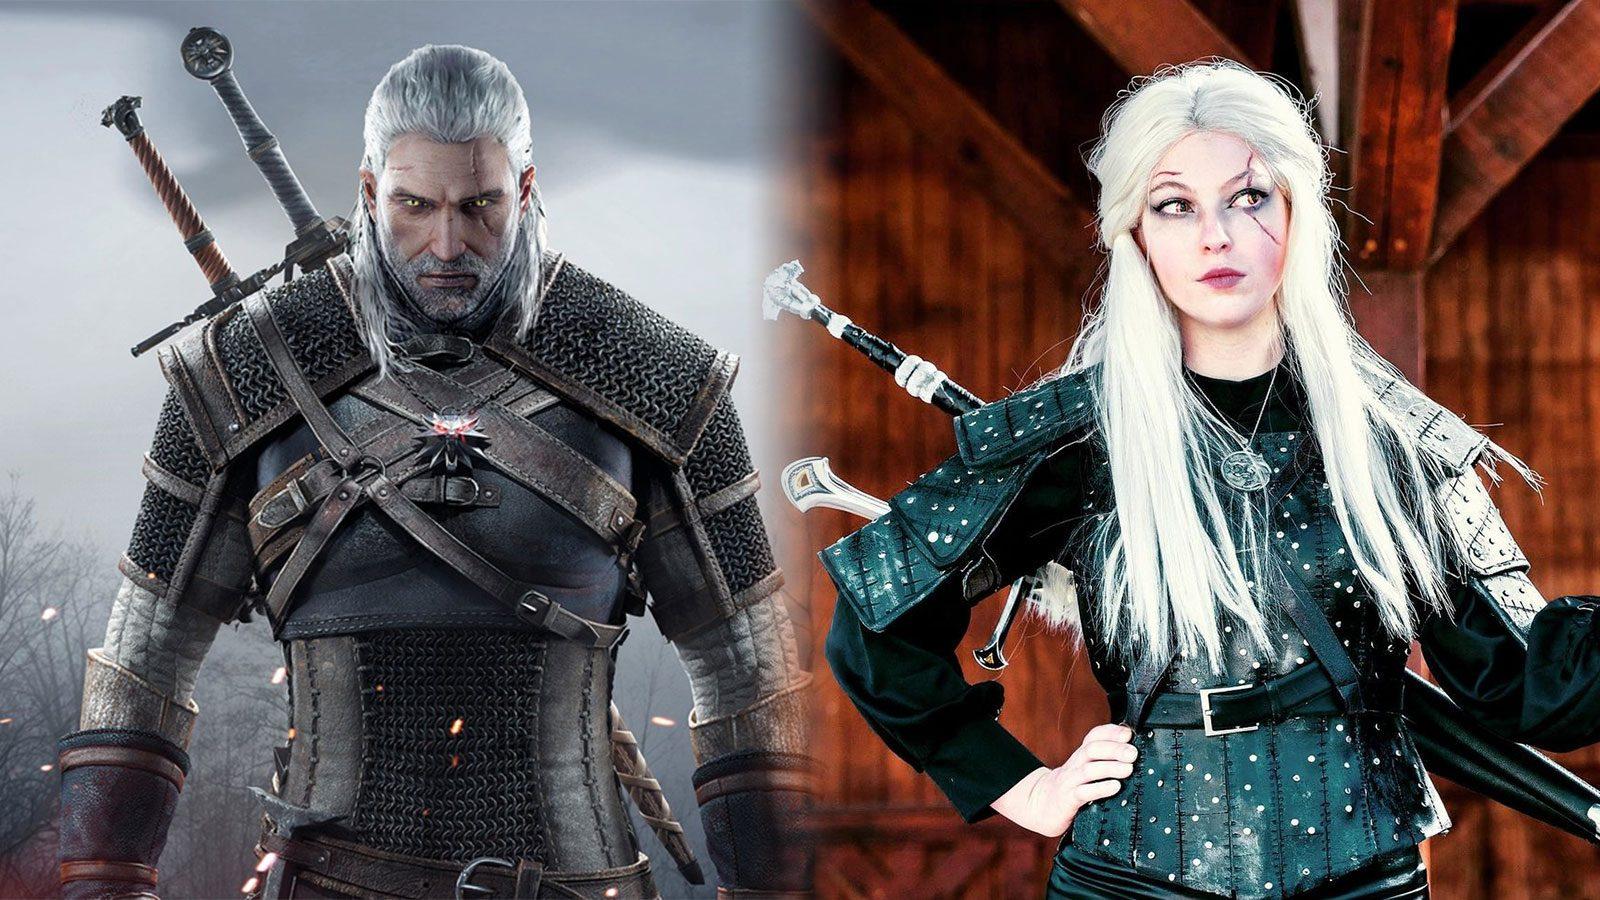 Le cosplay de Geralt de Erin J. B. White